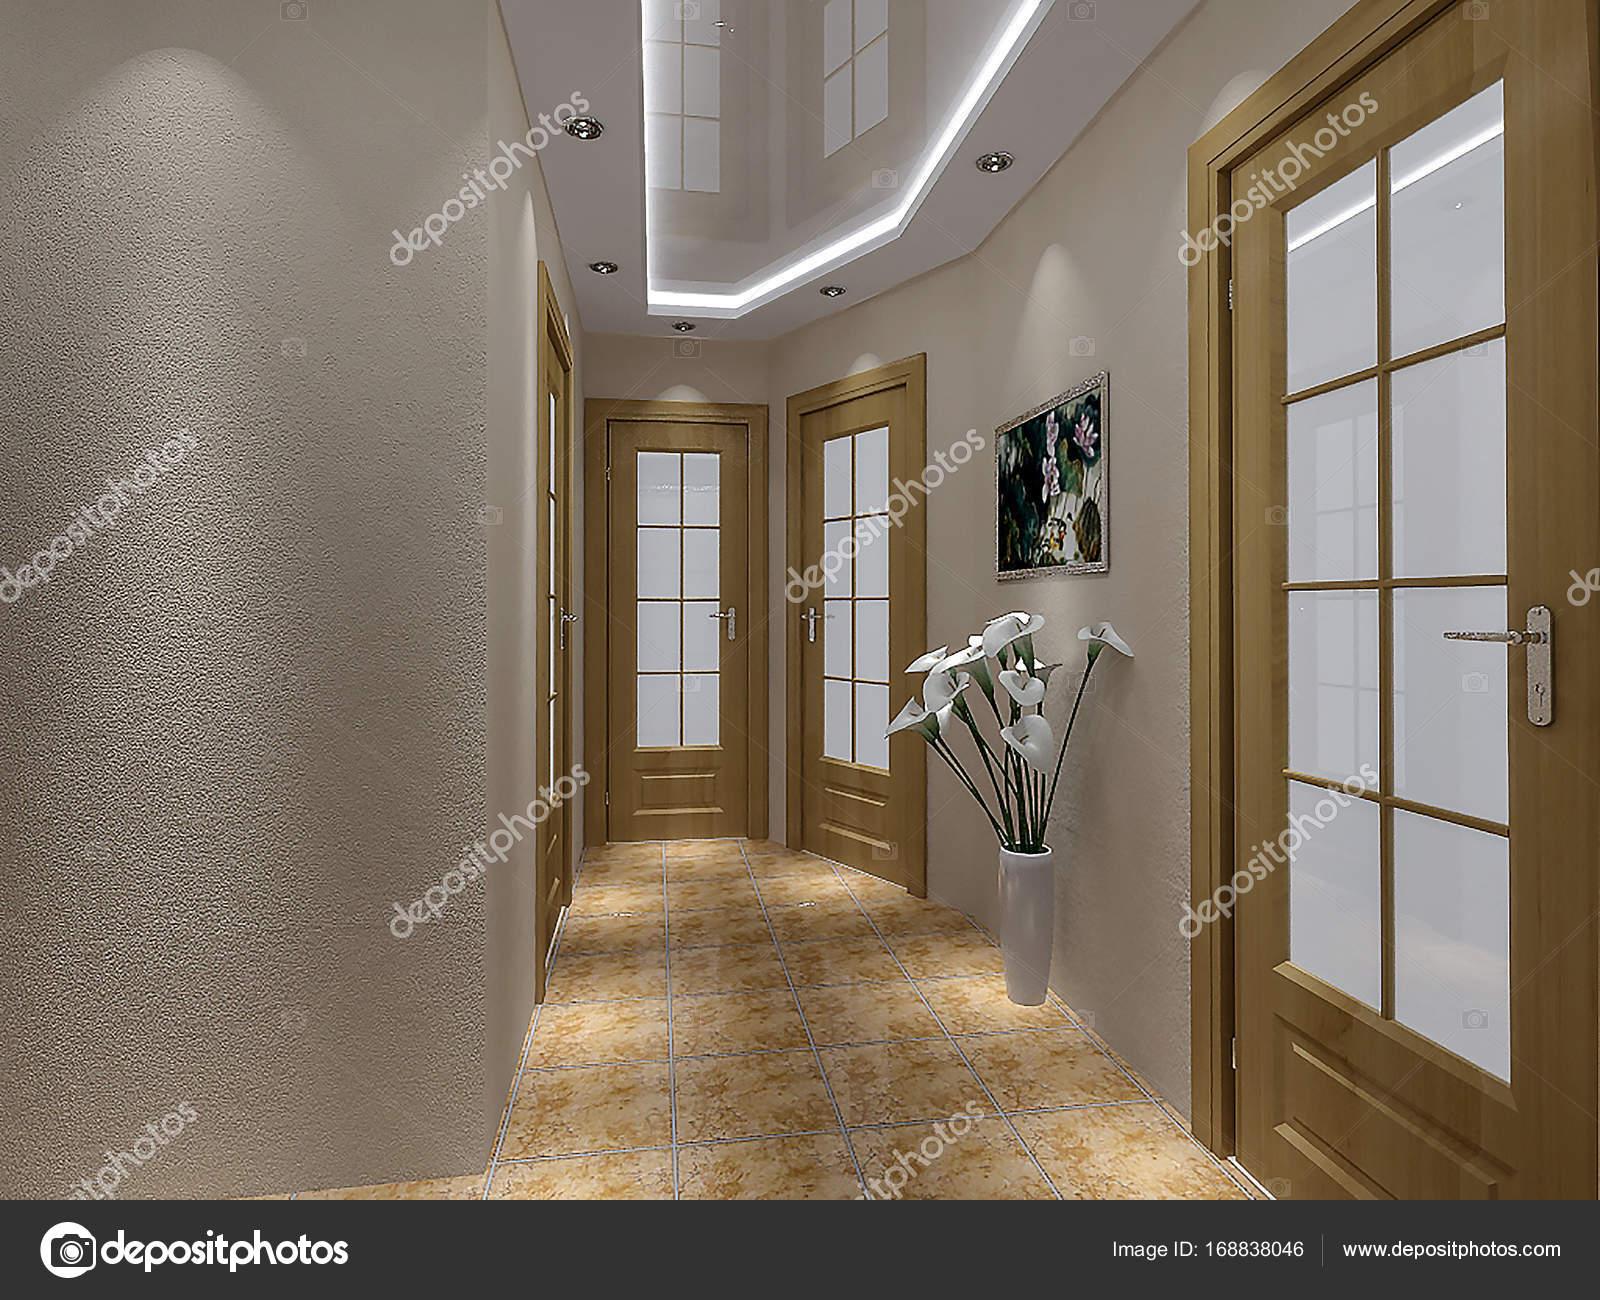 Huis hal elegant ontwerp 3d illustratie u2014 stockfoto © threedicube